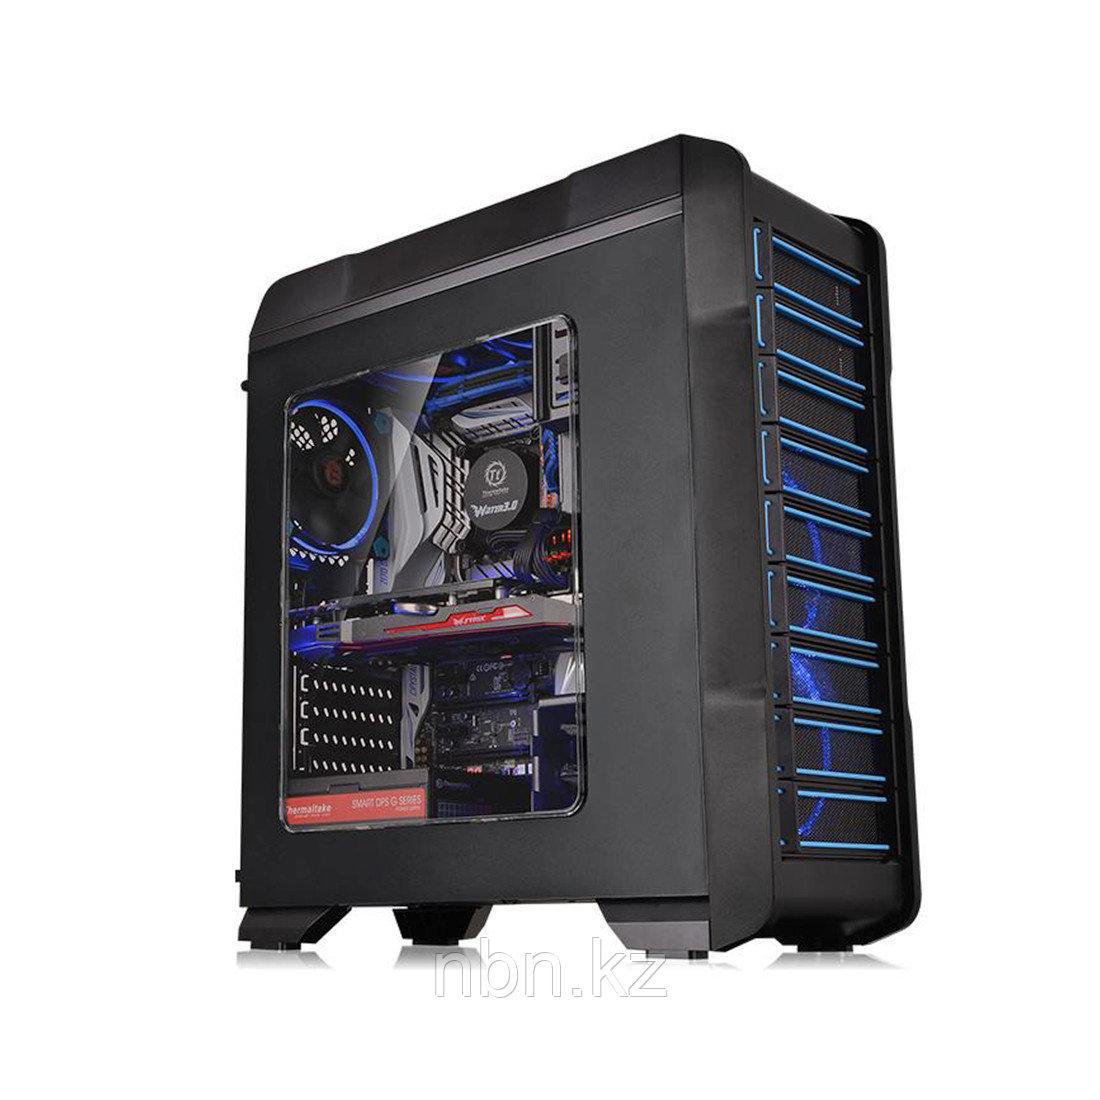 Компьютерный корпус Thermaltake Versa N23 без Б/П